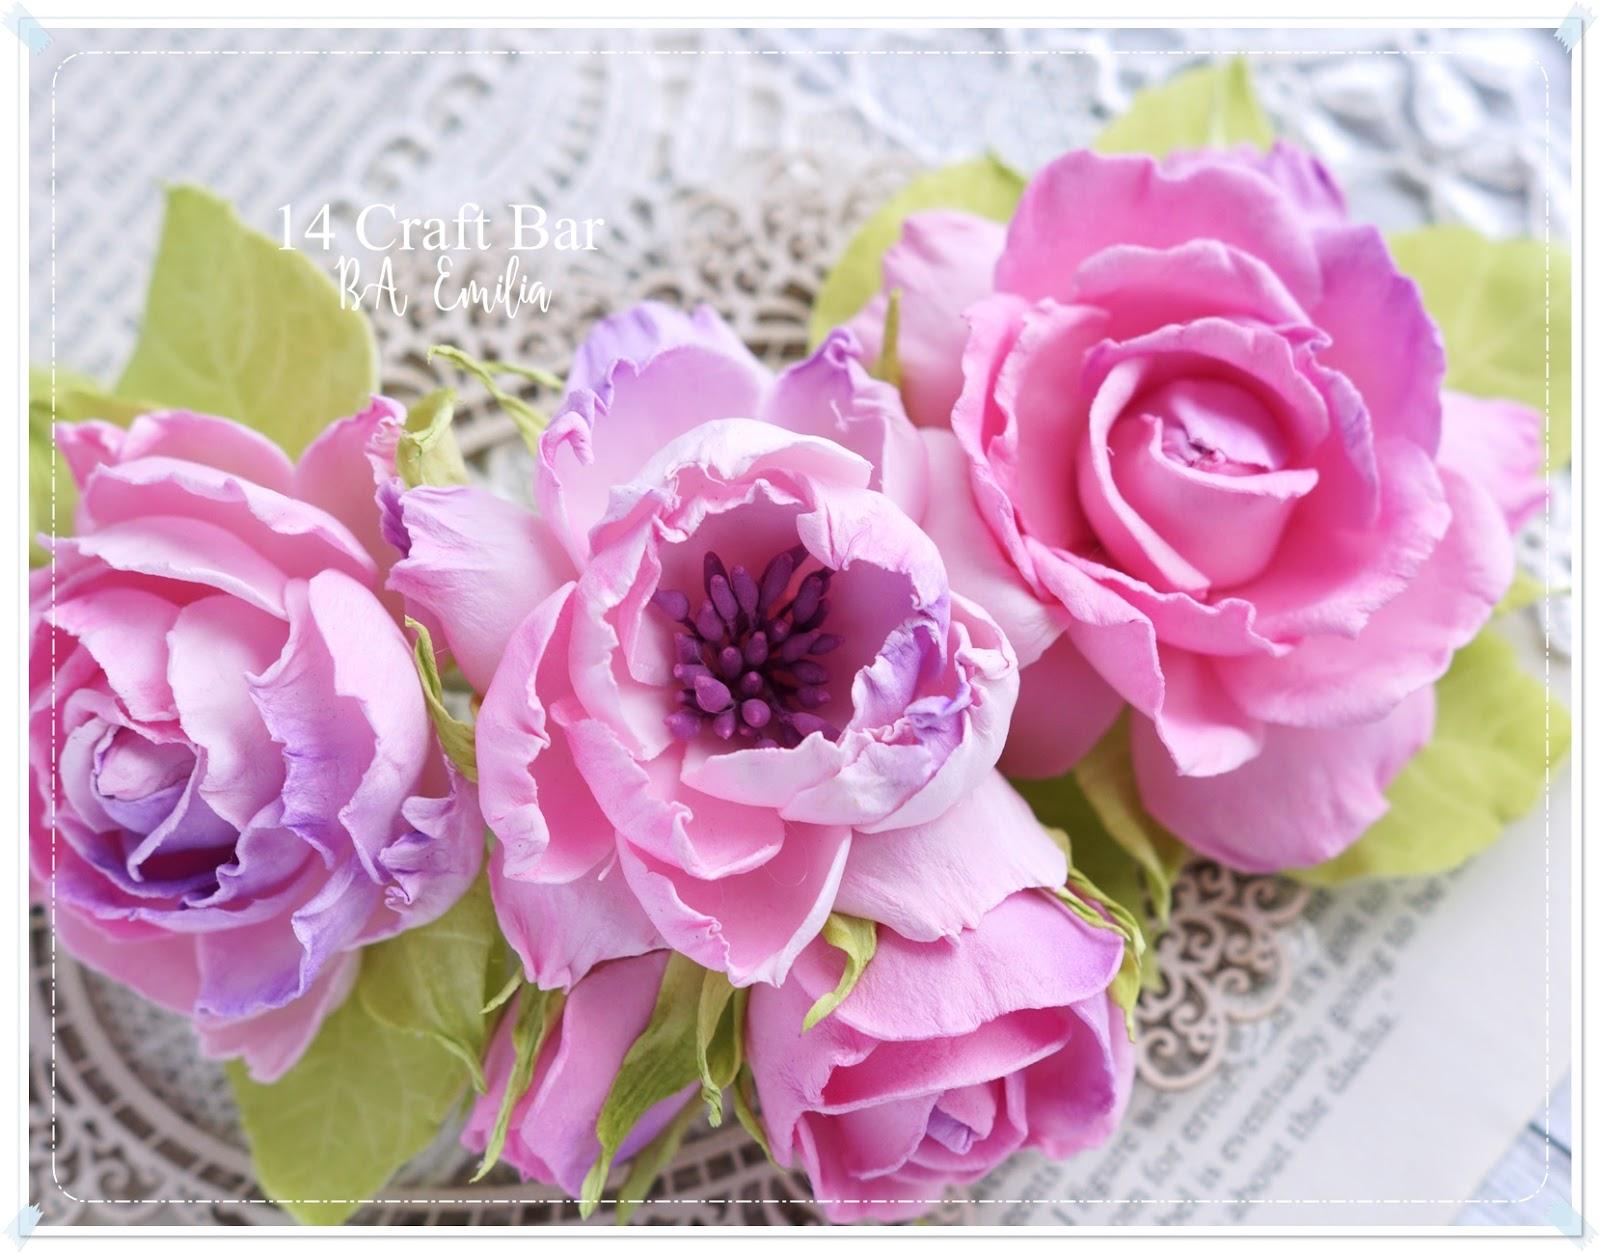 Silk Foam Flowers In Pink By Lady E 14 Craft Bar